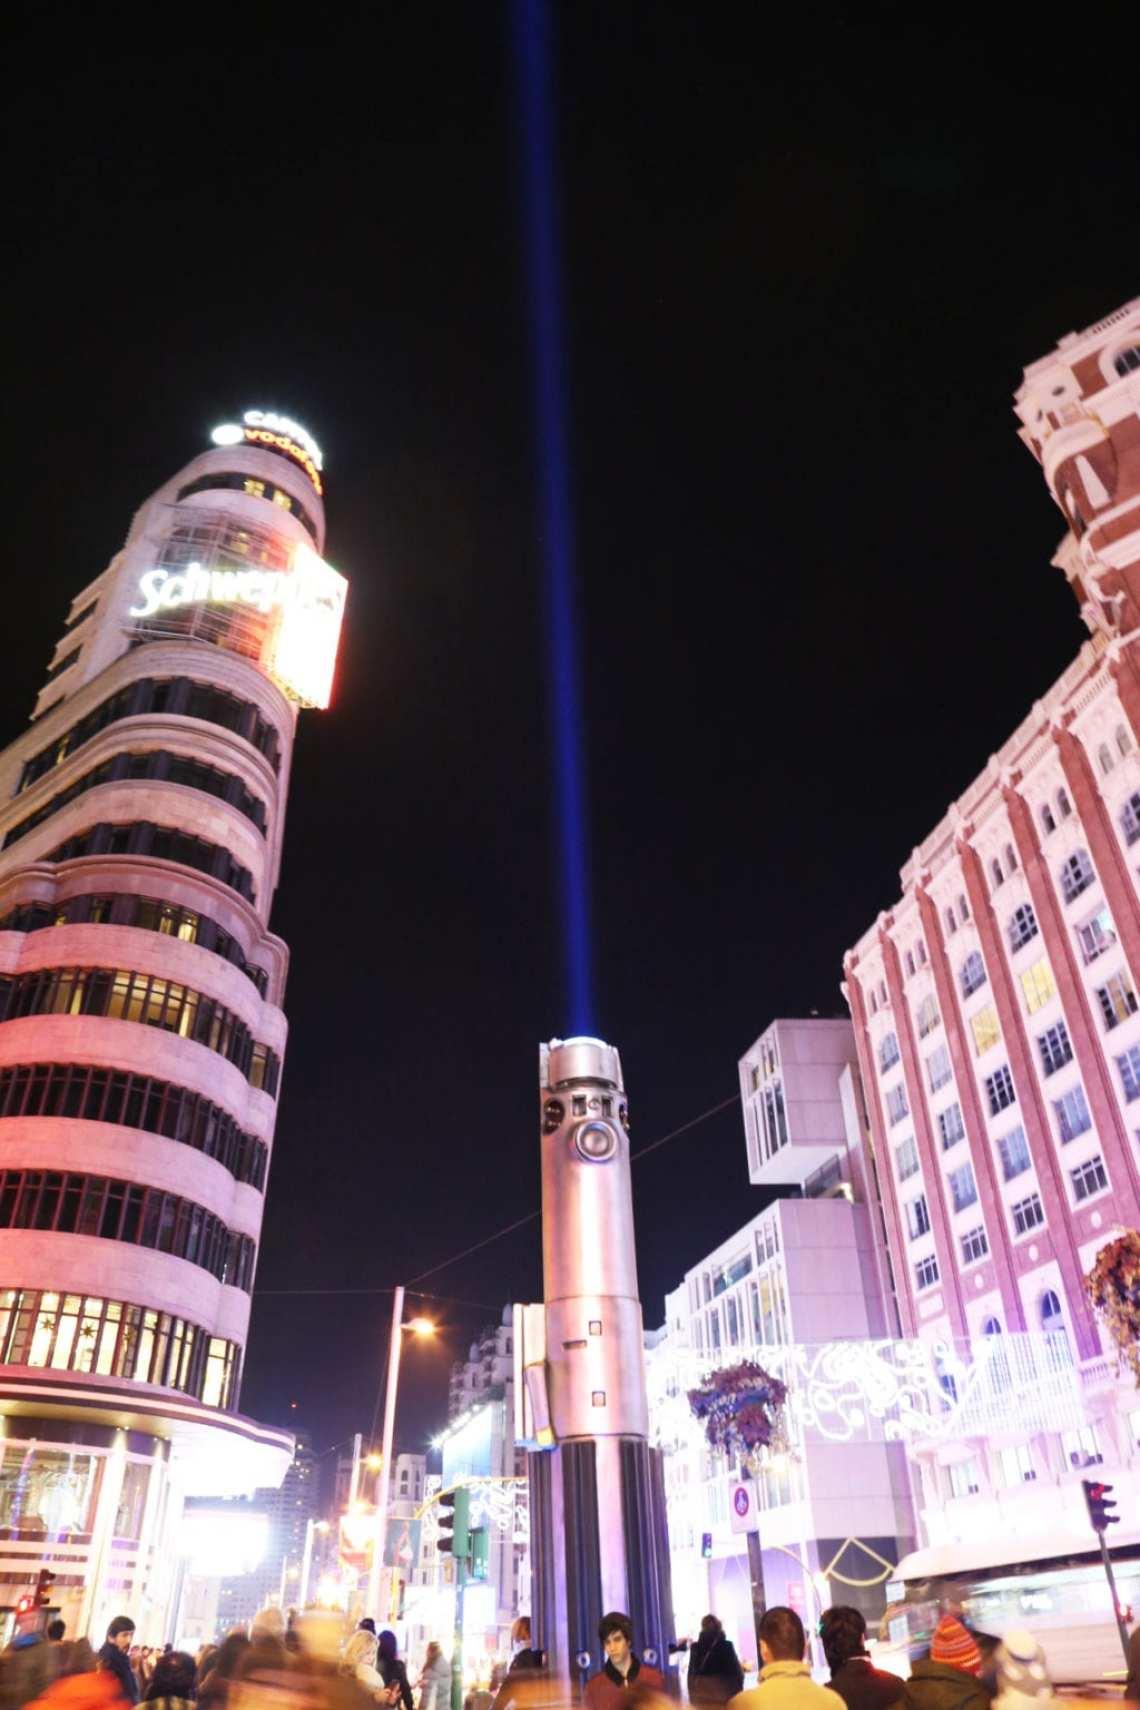 CALLAO - Las espadas láser de Star Wars iluminan Madrid